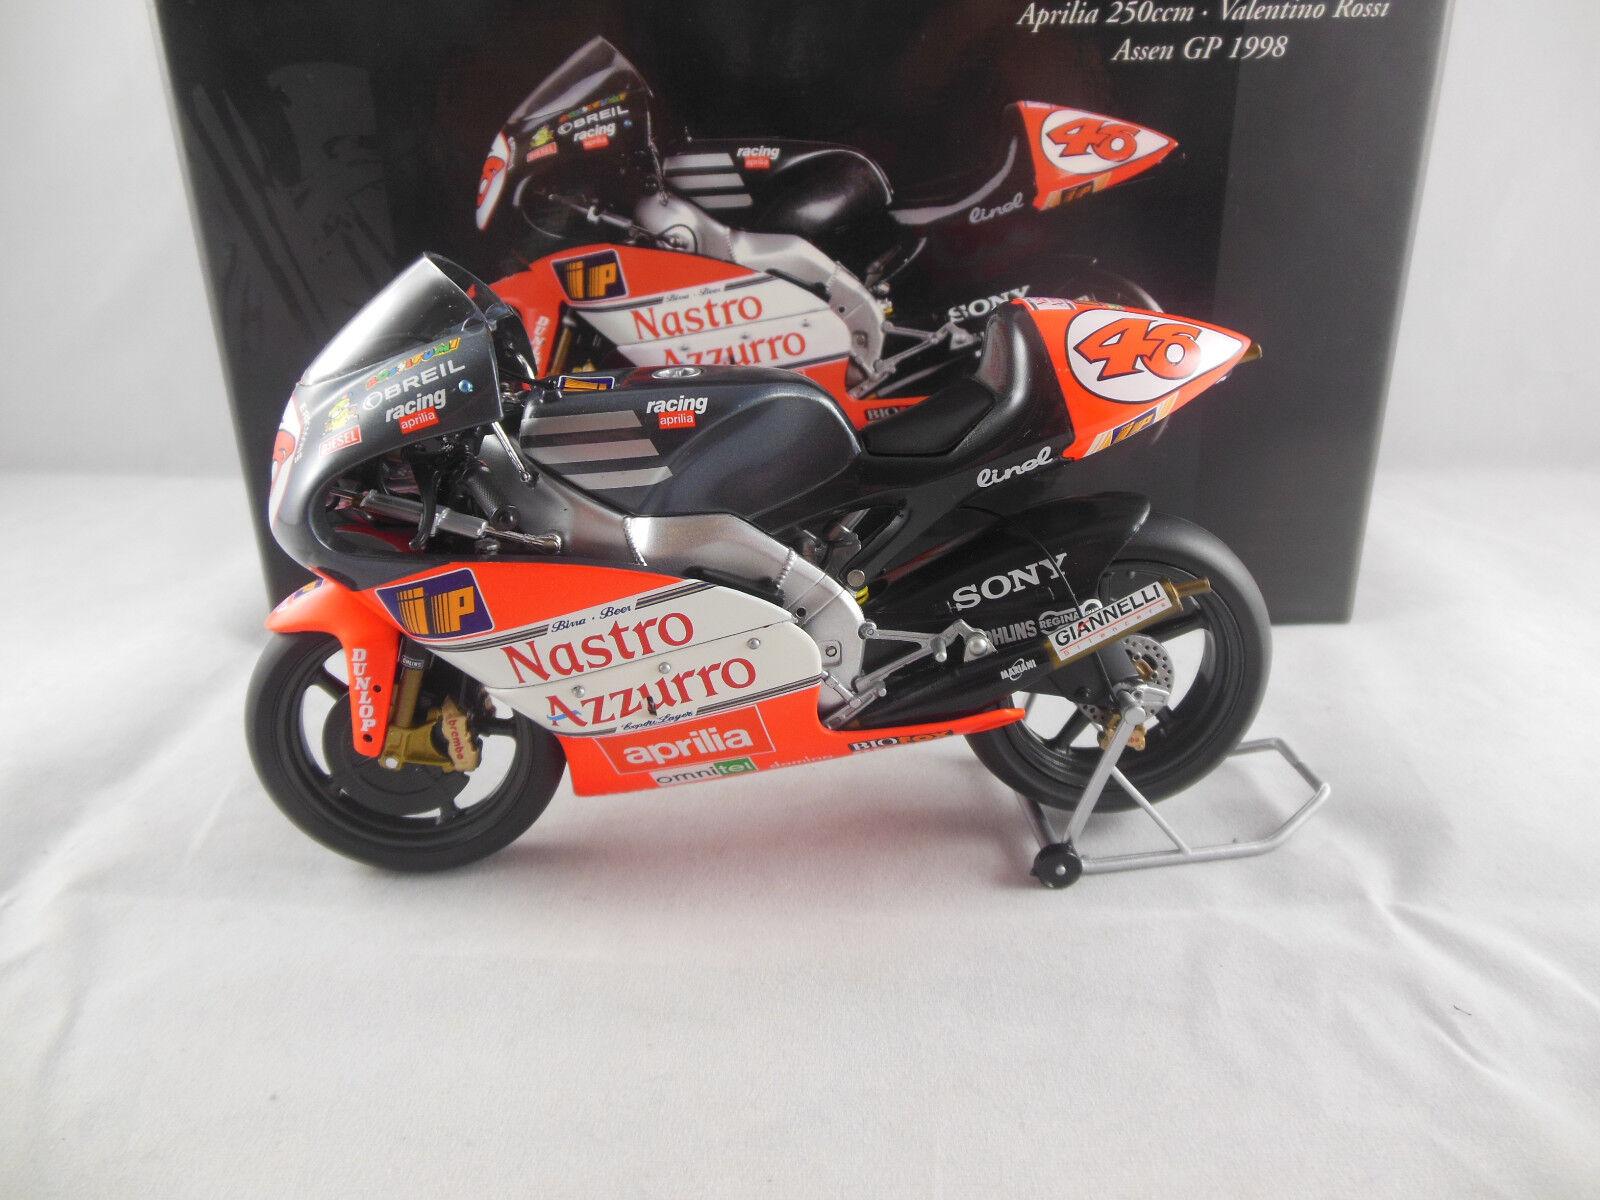 Minichamps 122 098046 APRILIA 250ccm TEAM NASTRO AZZURRO ASSEN GP 1998 V ROSSI